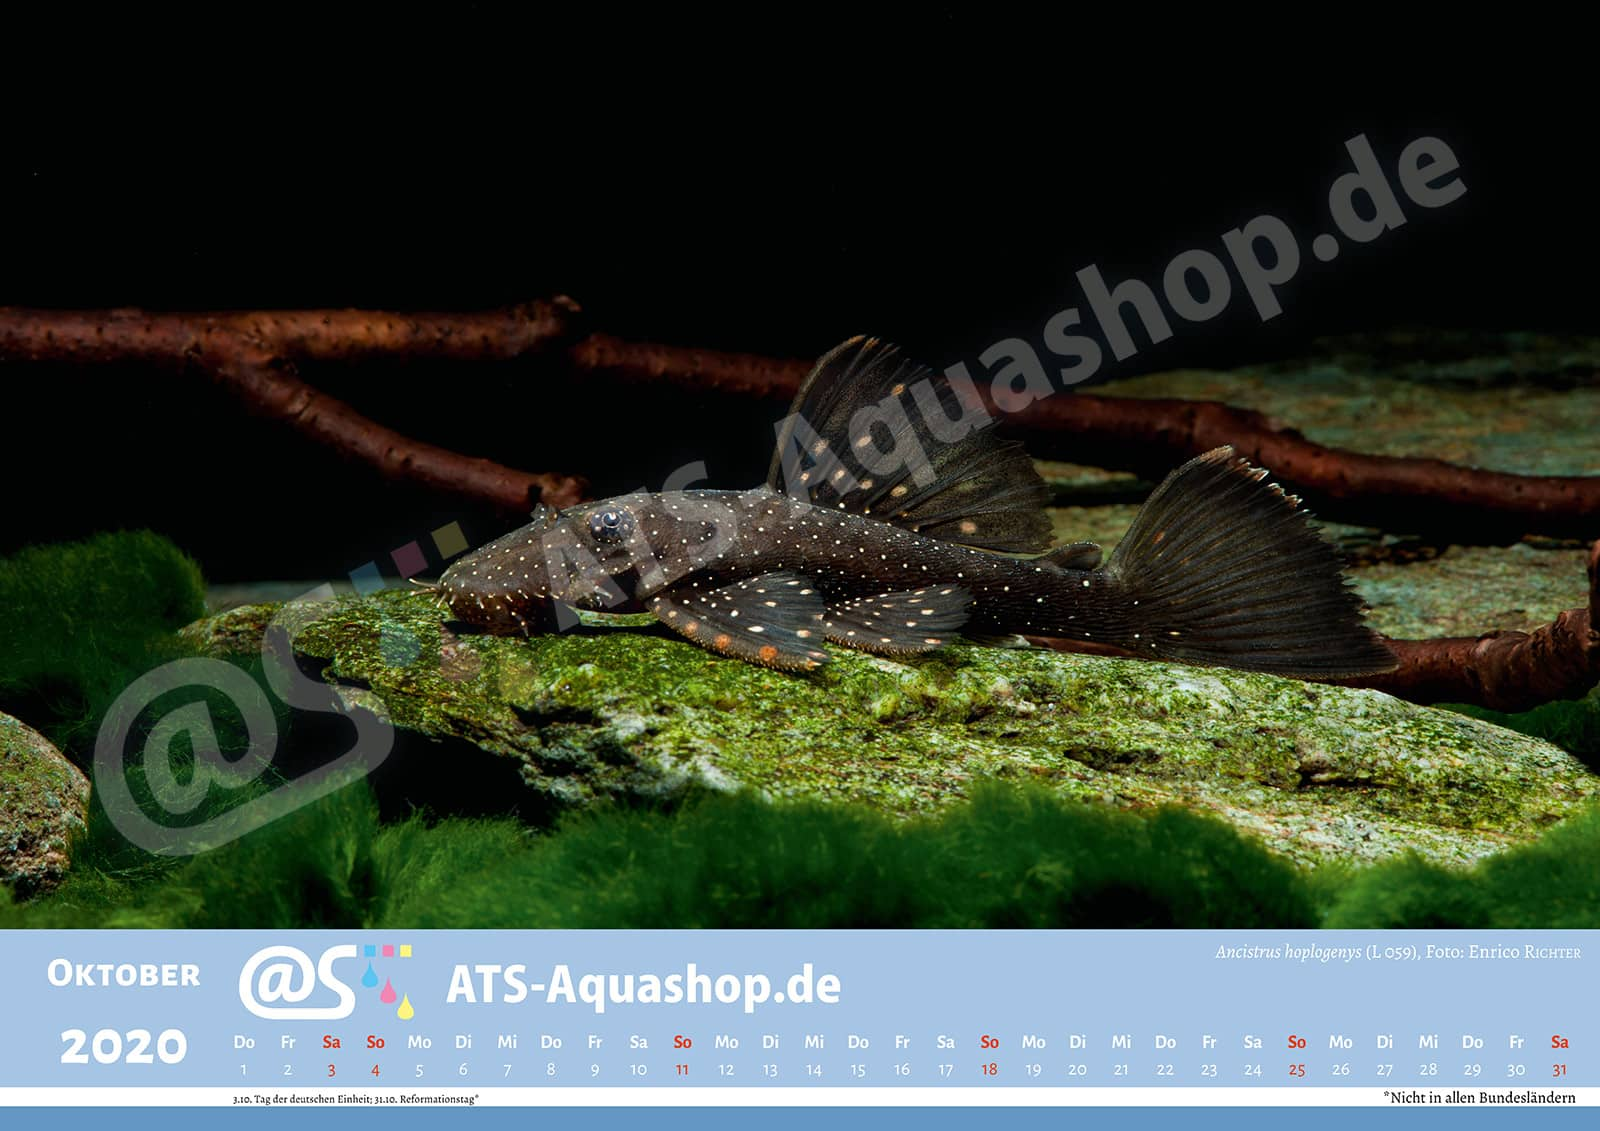 Foto Jahreskalender 2020 DIN A3: Ancistrus hoplogenys(L 059)